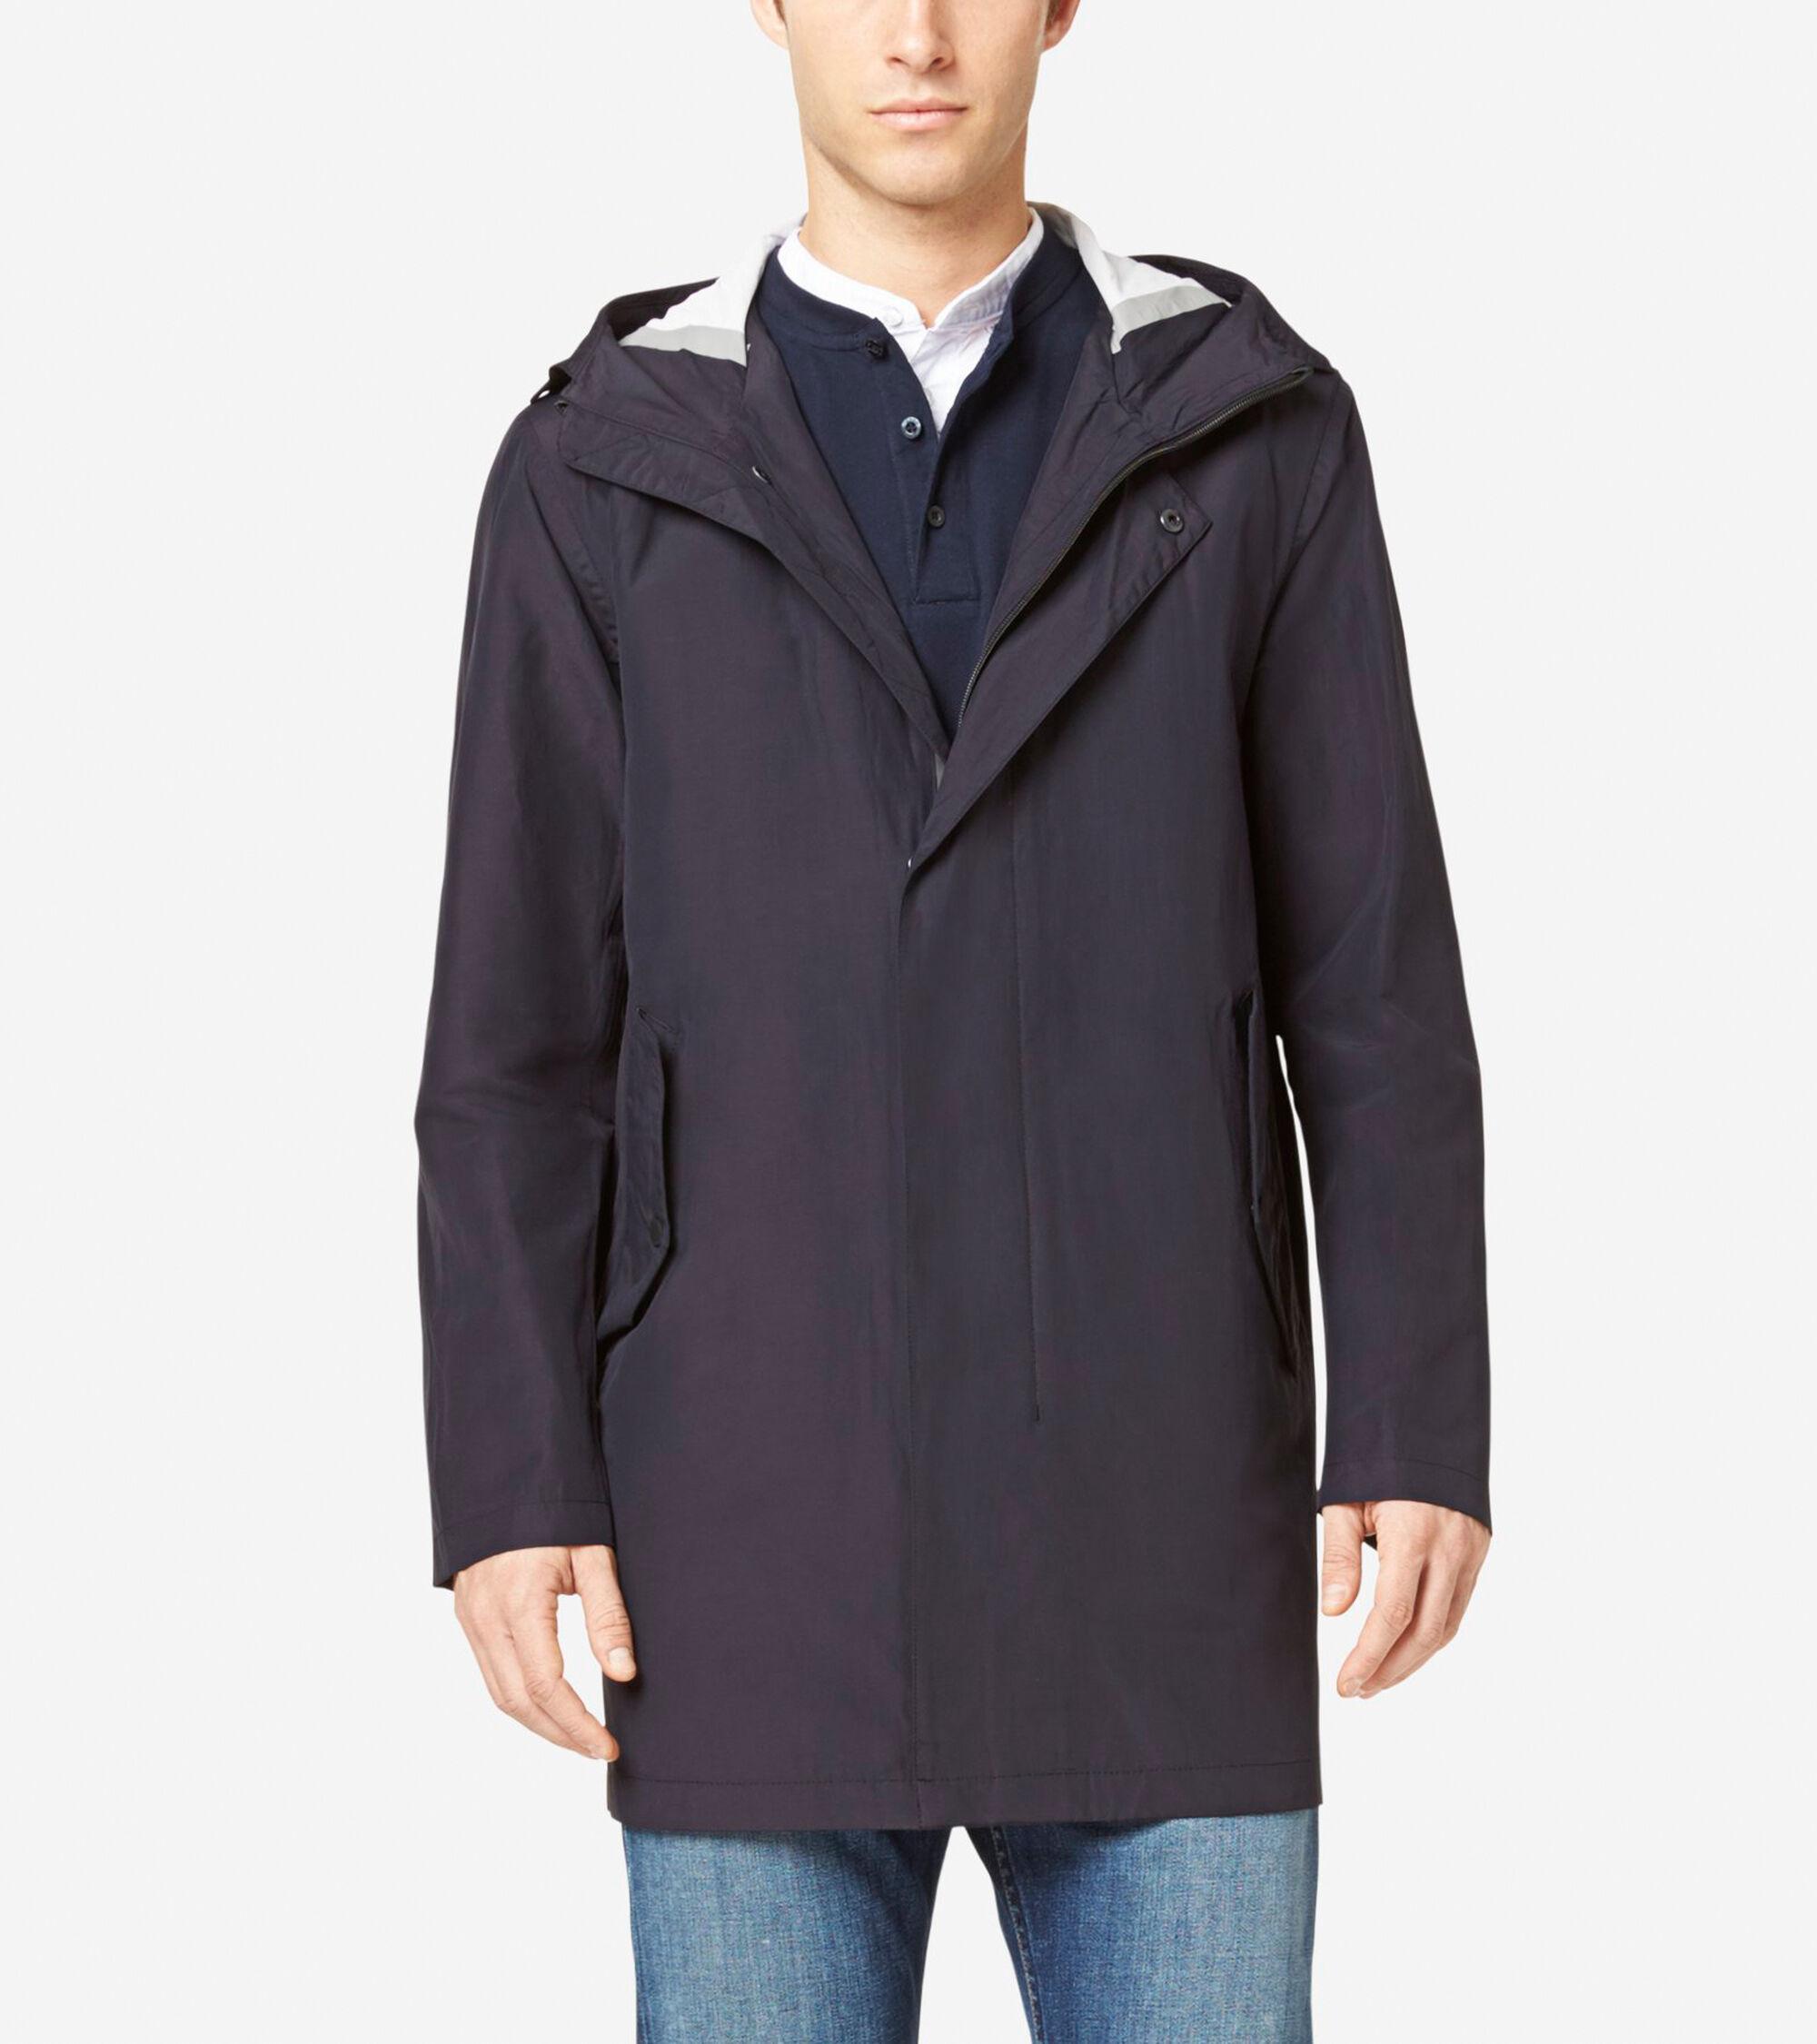 Cole Haan Men's Seamsealed Hooded Topper Jacket